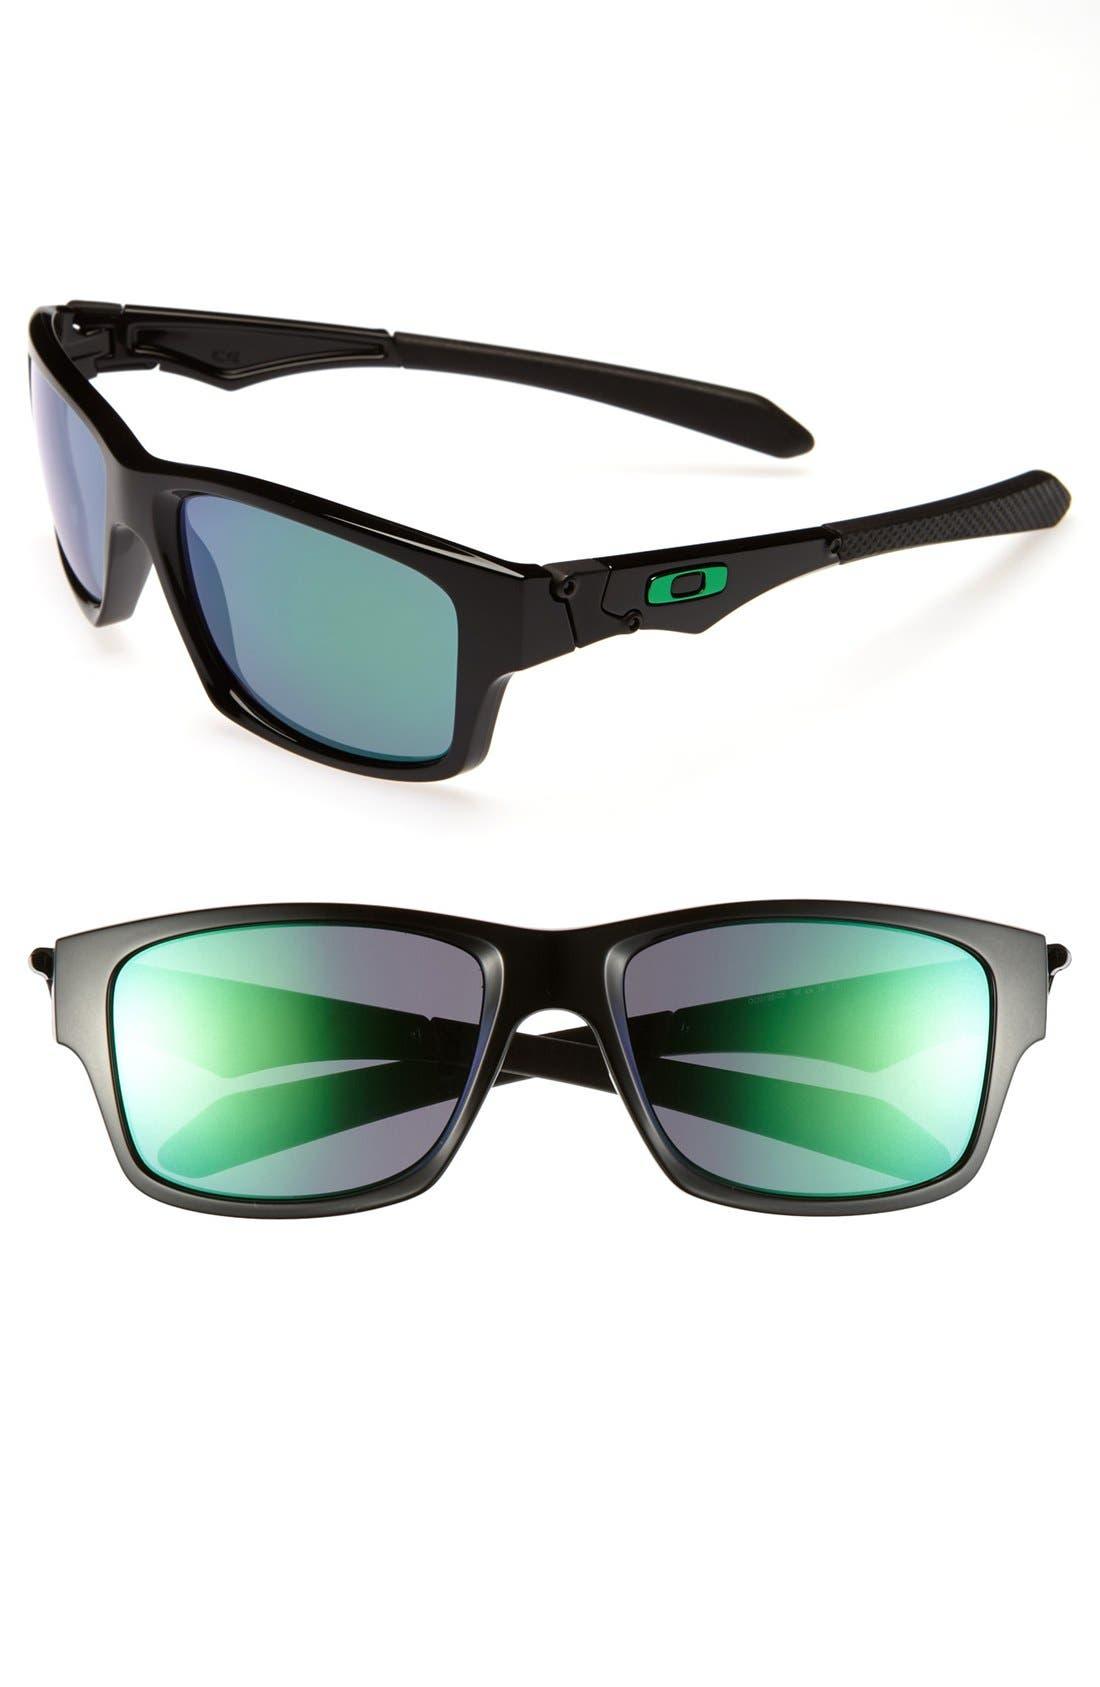 Main Image - Oakley 'Jupiter Squared' 56mm Sunglasses